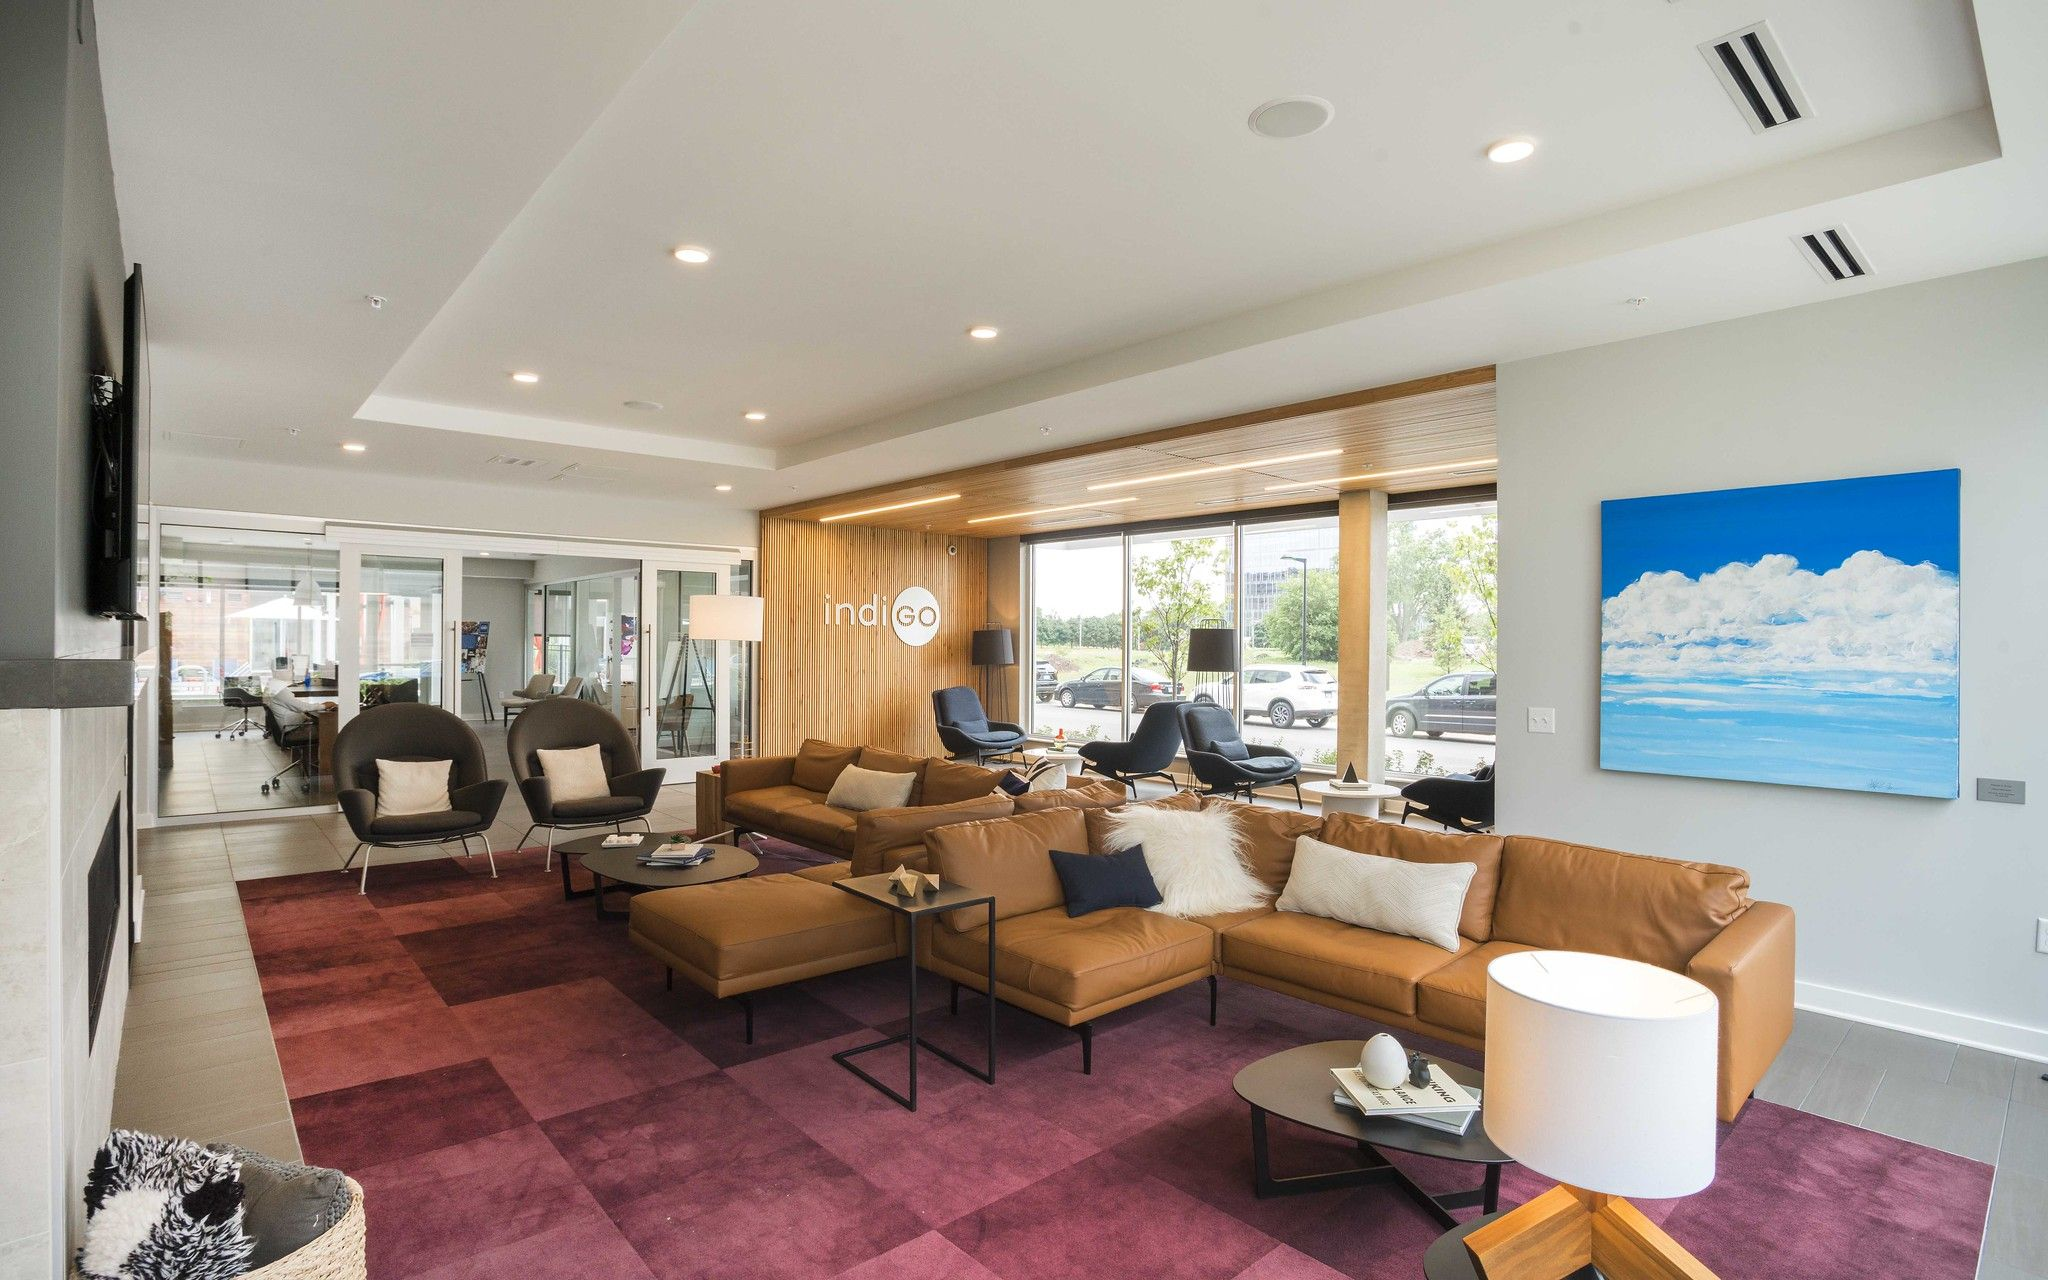 Indigo Apartments Bloomington Mn Apartment Home Floors And More